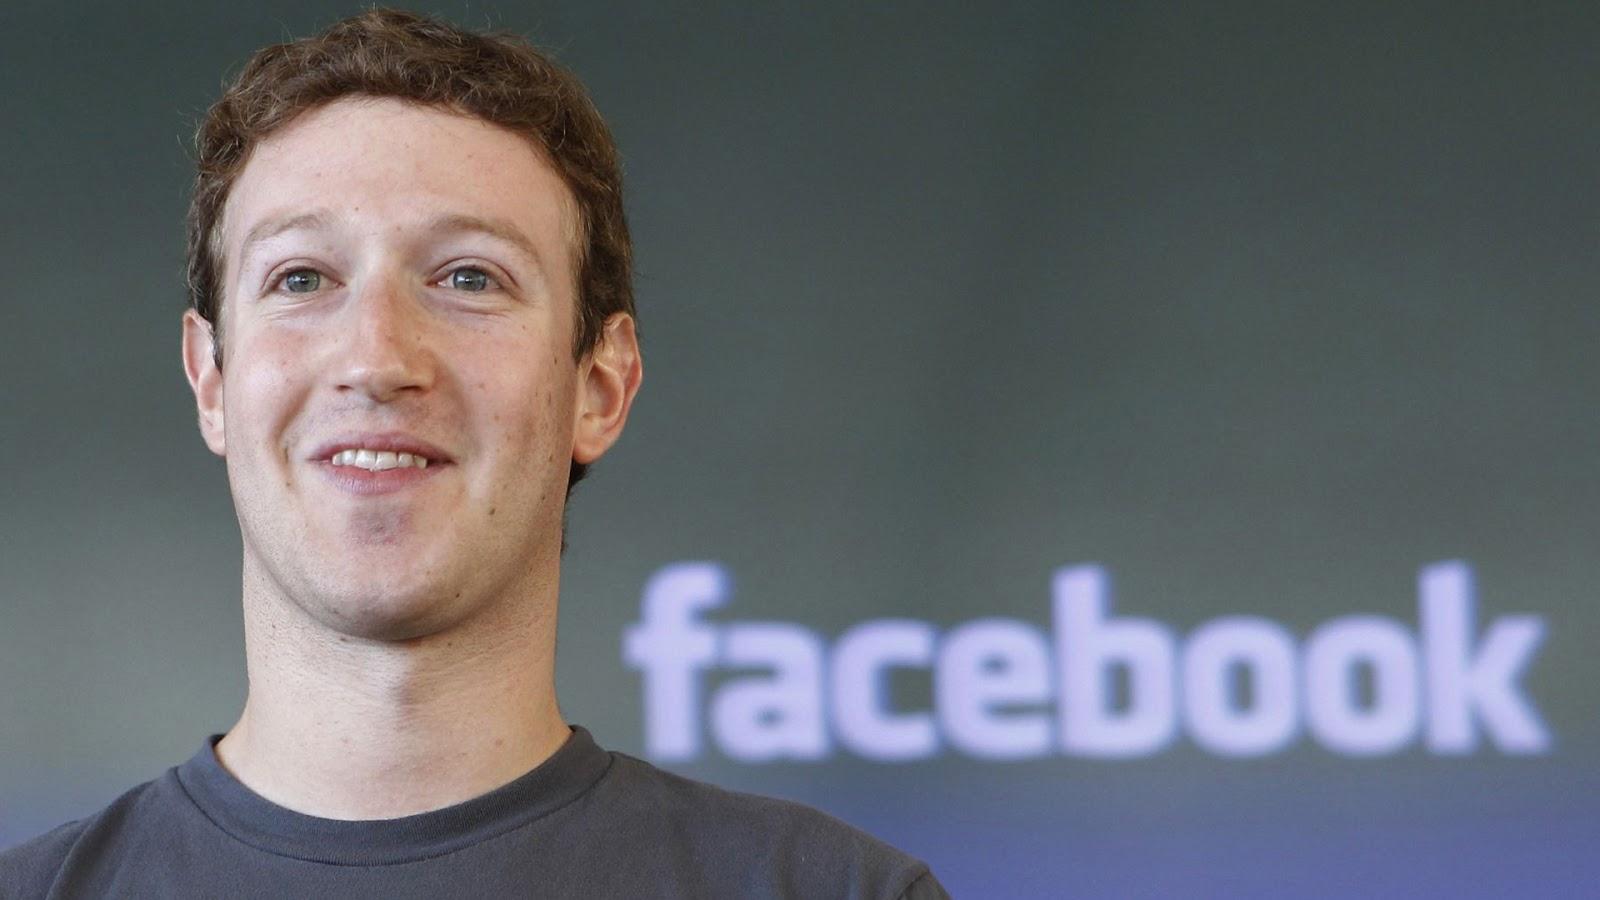 download image mark zuckerberg - photo #9